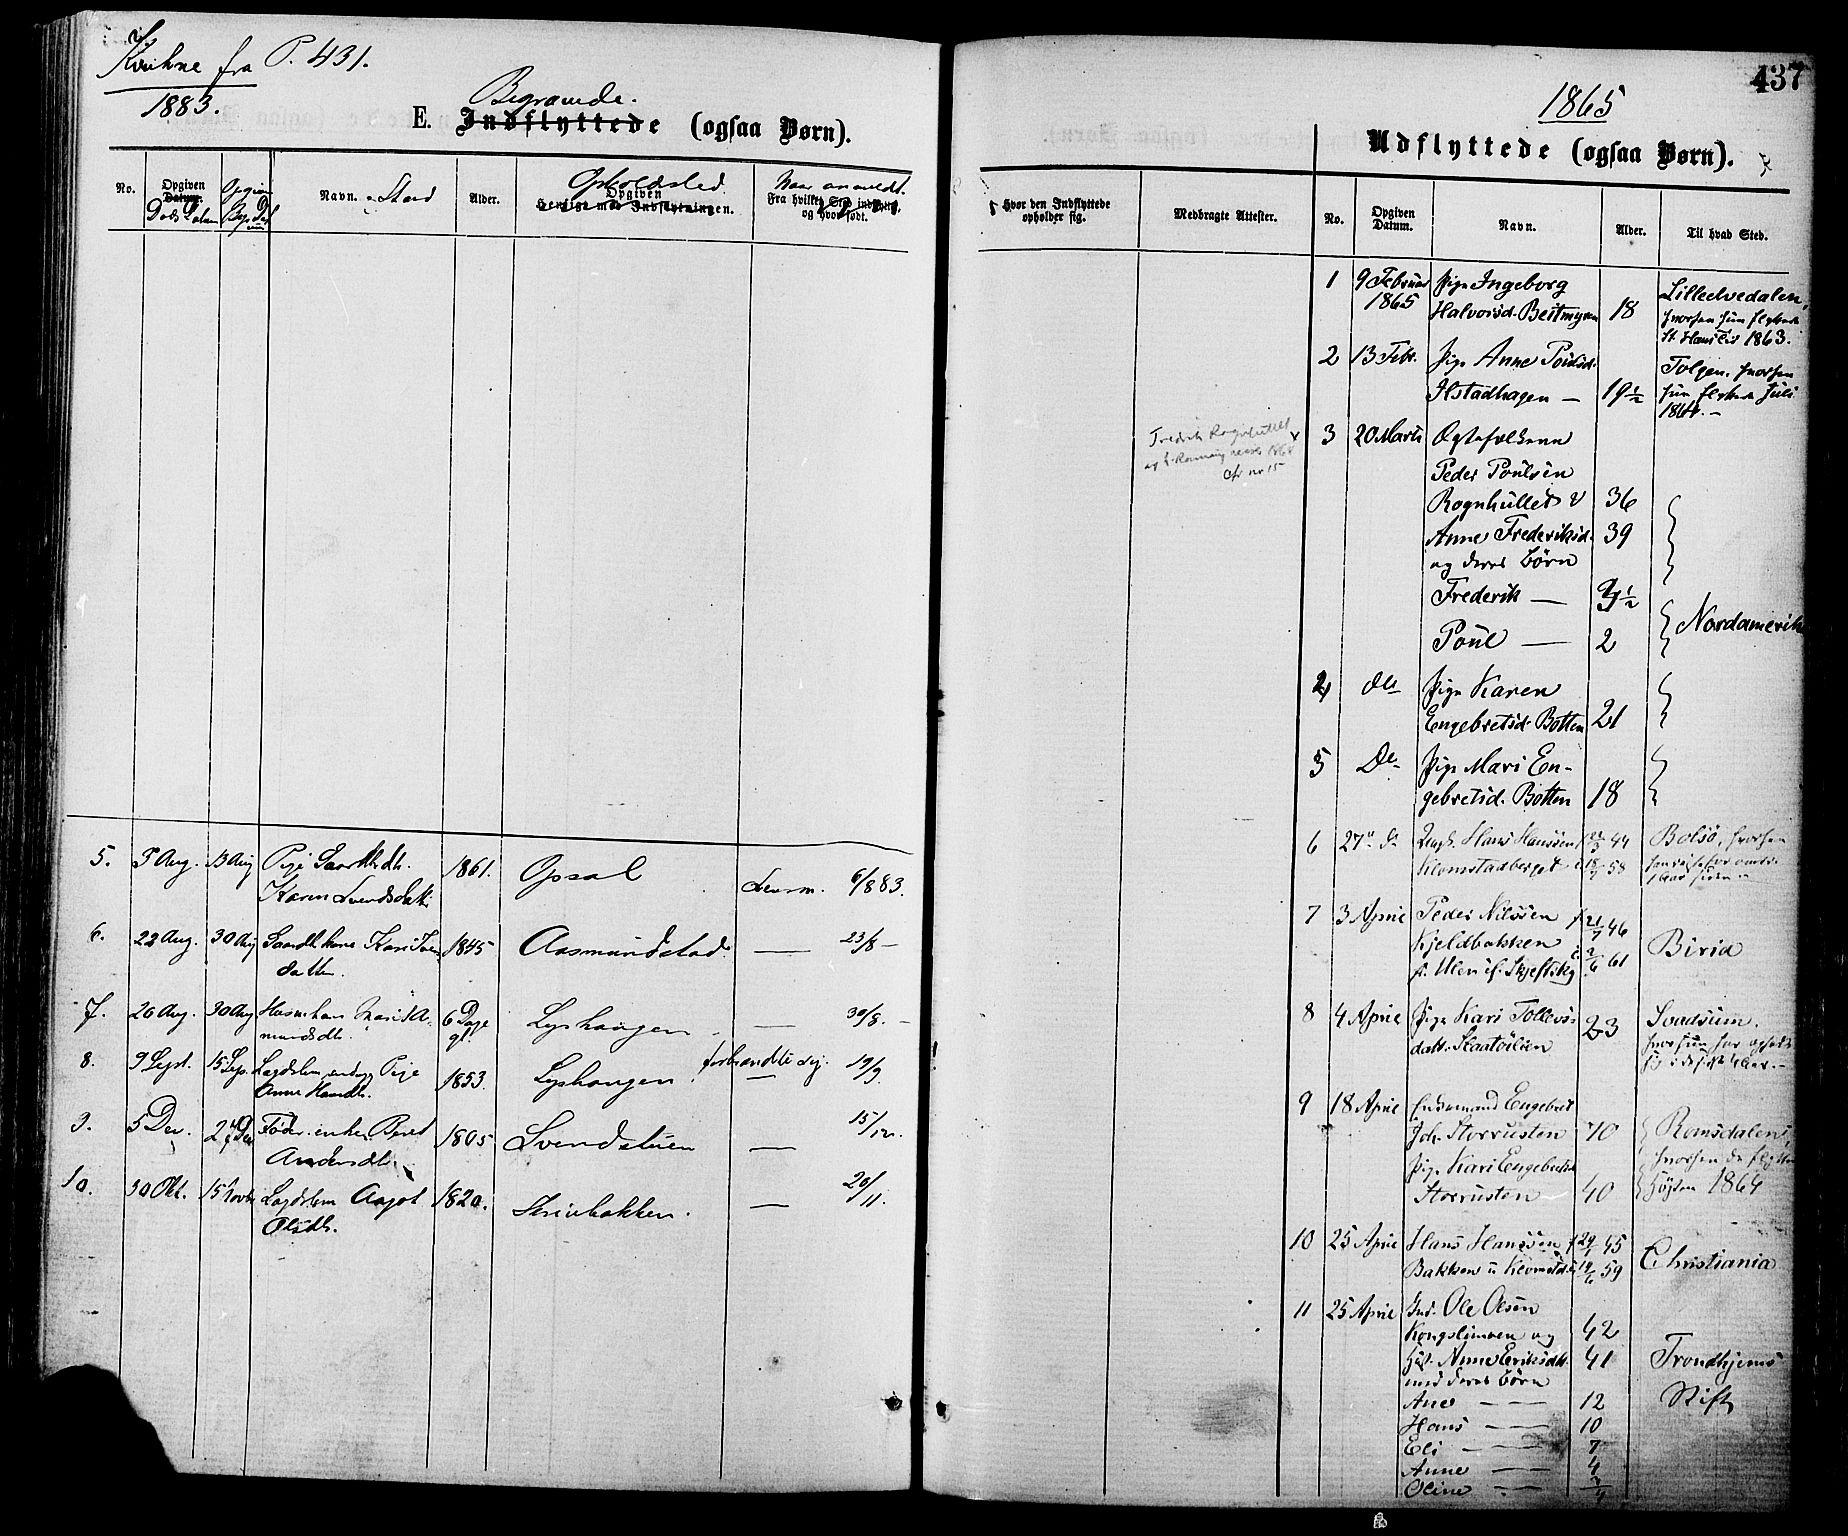 SAH, Nord-Fron prestekontor, Ministerialbok nr. 2, 1865-1883, s. 437